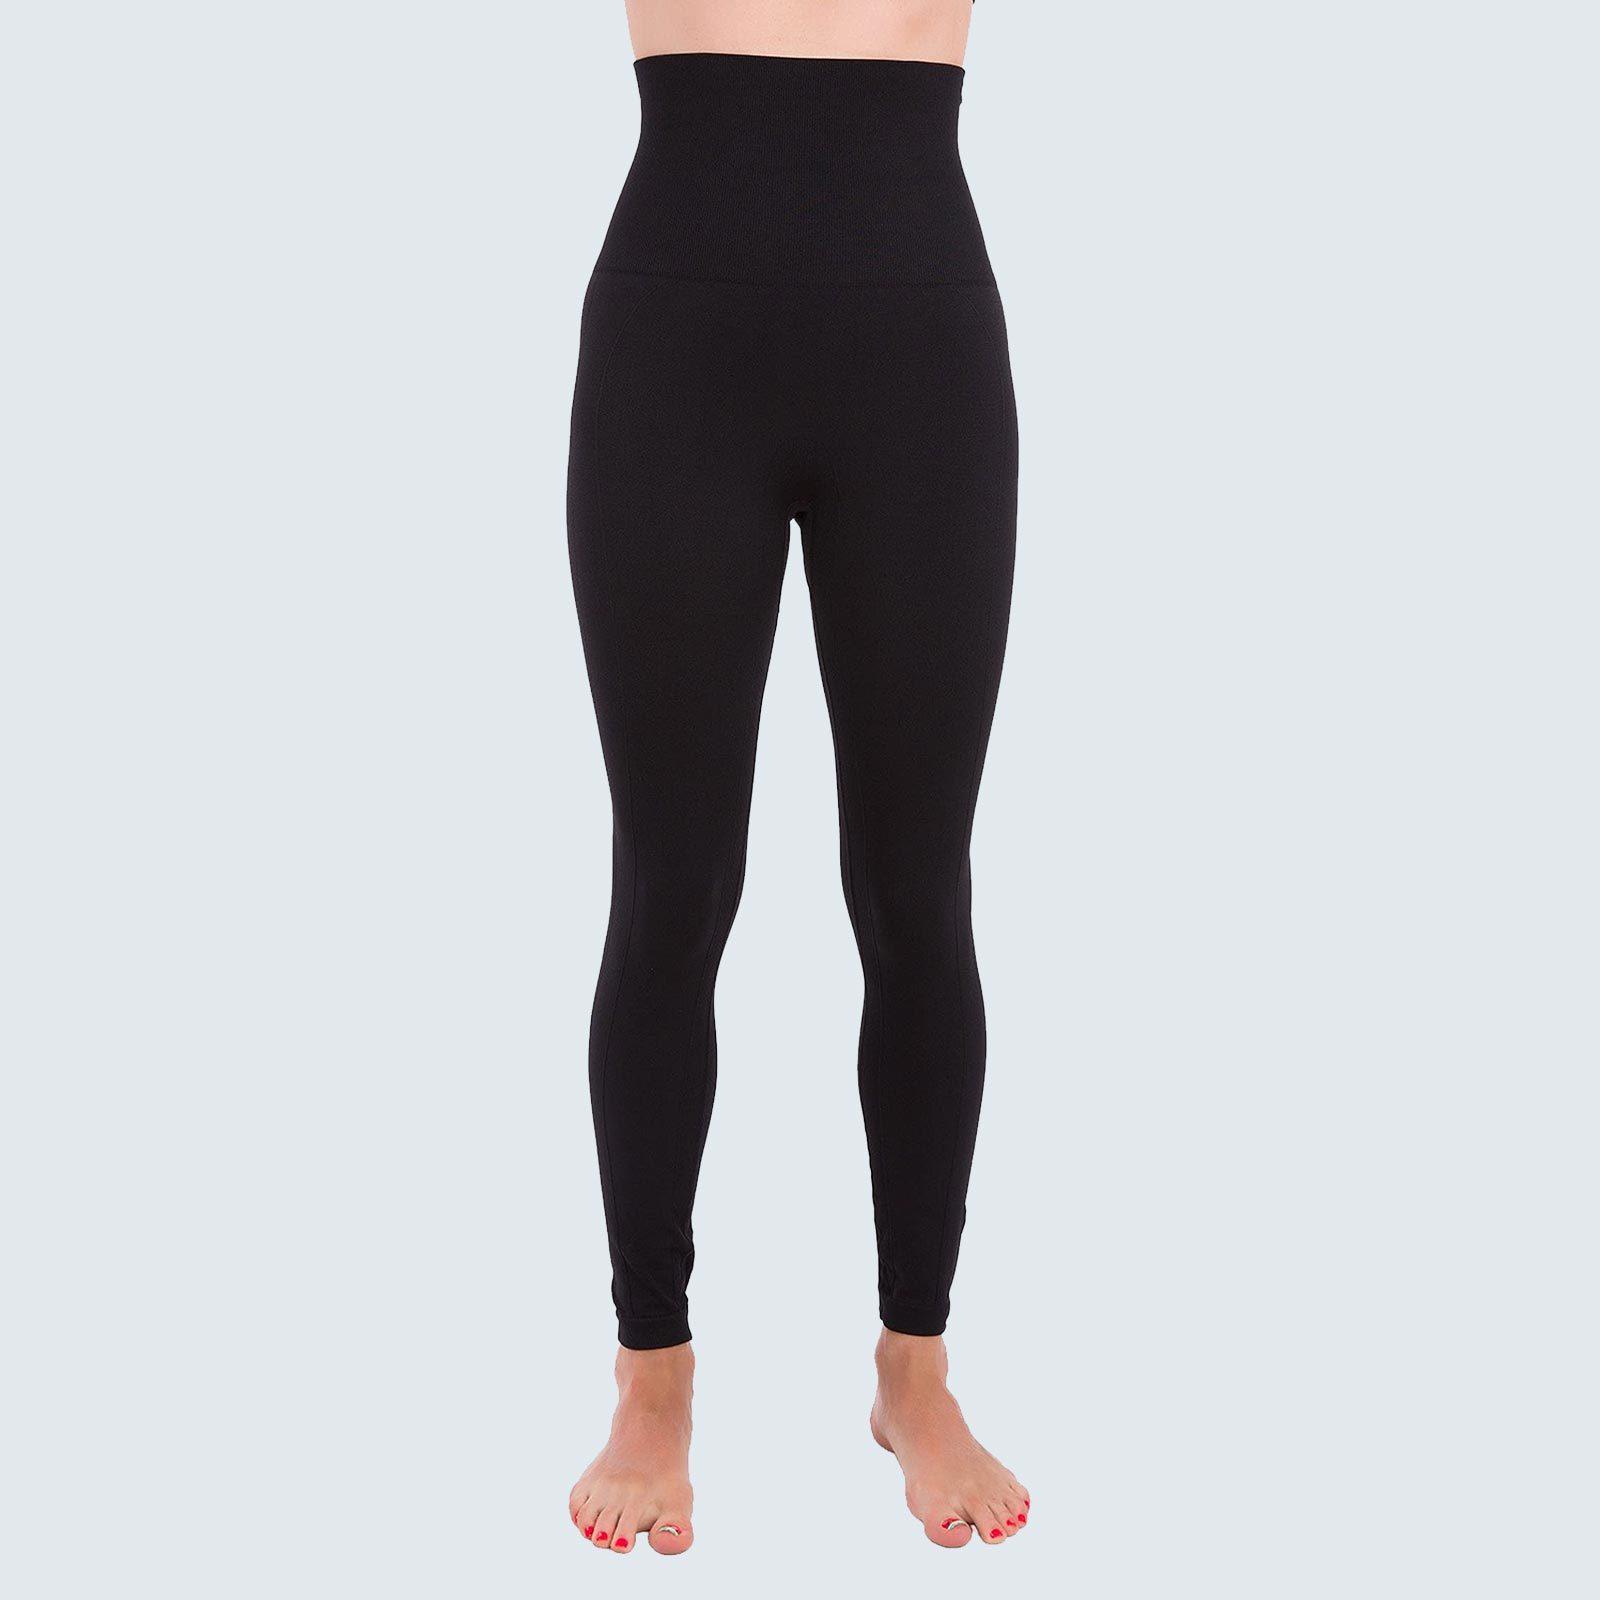 Best leggings for gentle belly compression: Homma Premium Compression Leggings